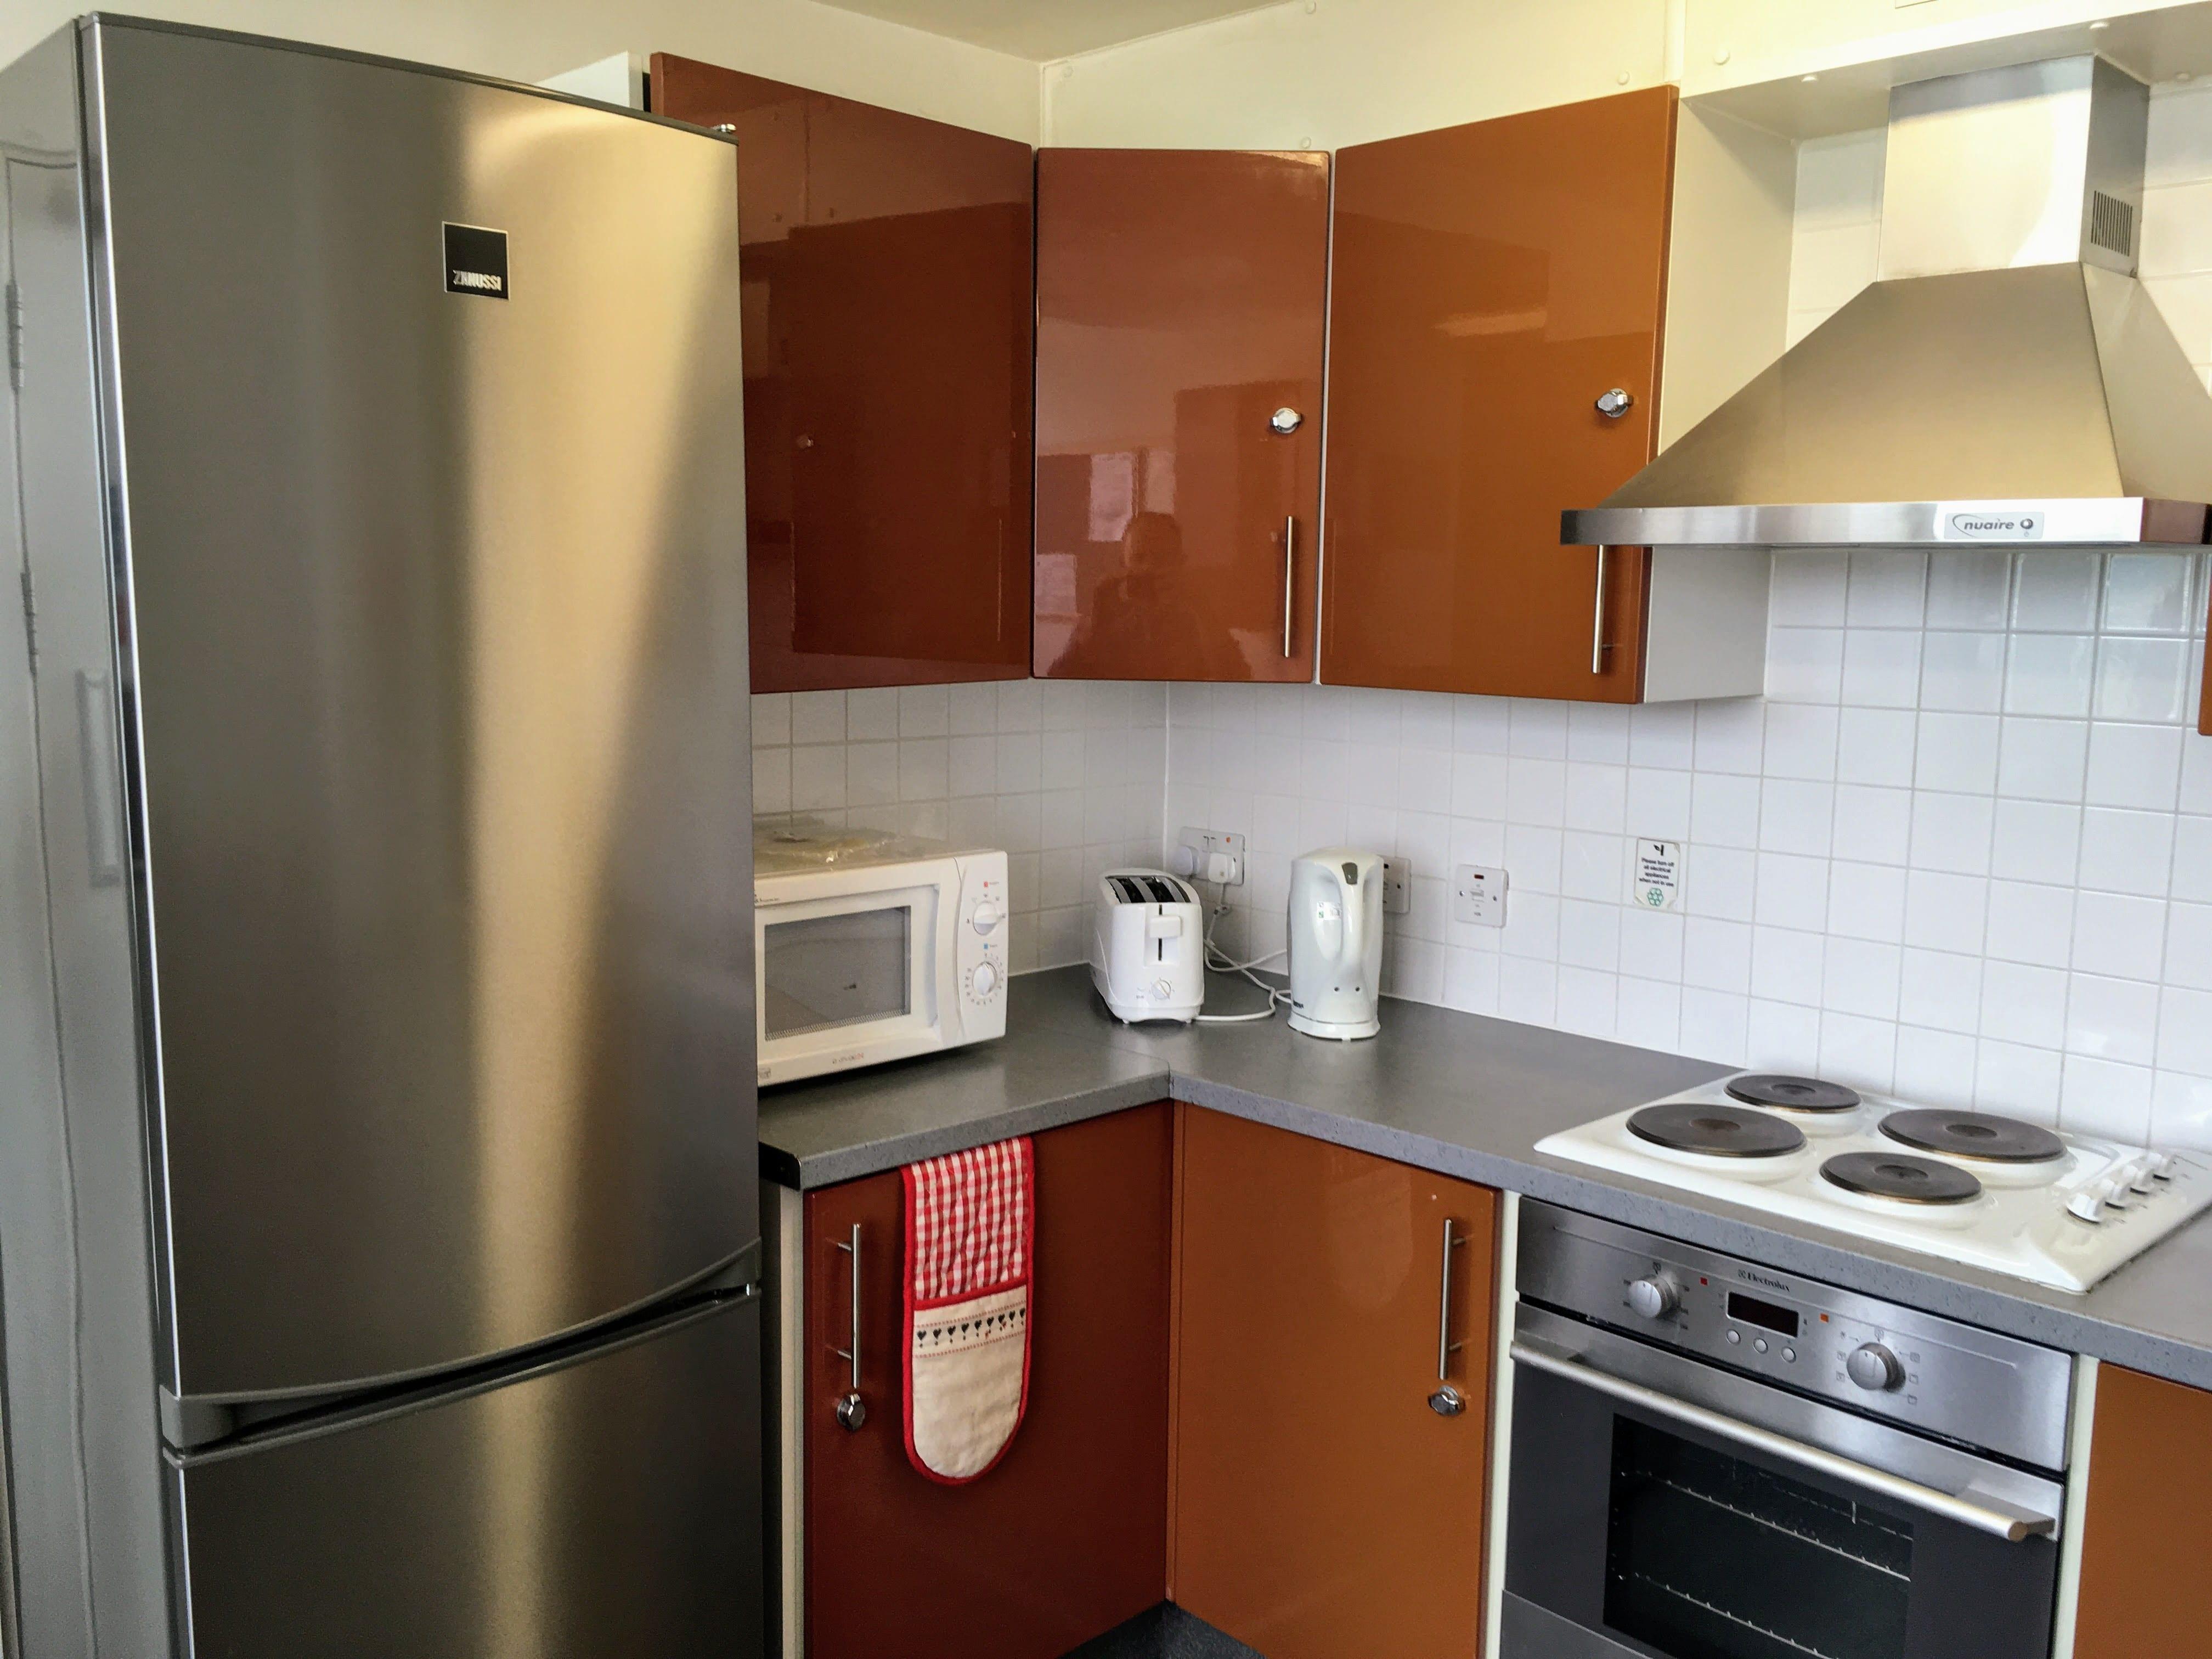 westminster housing - kitchen 2